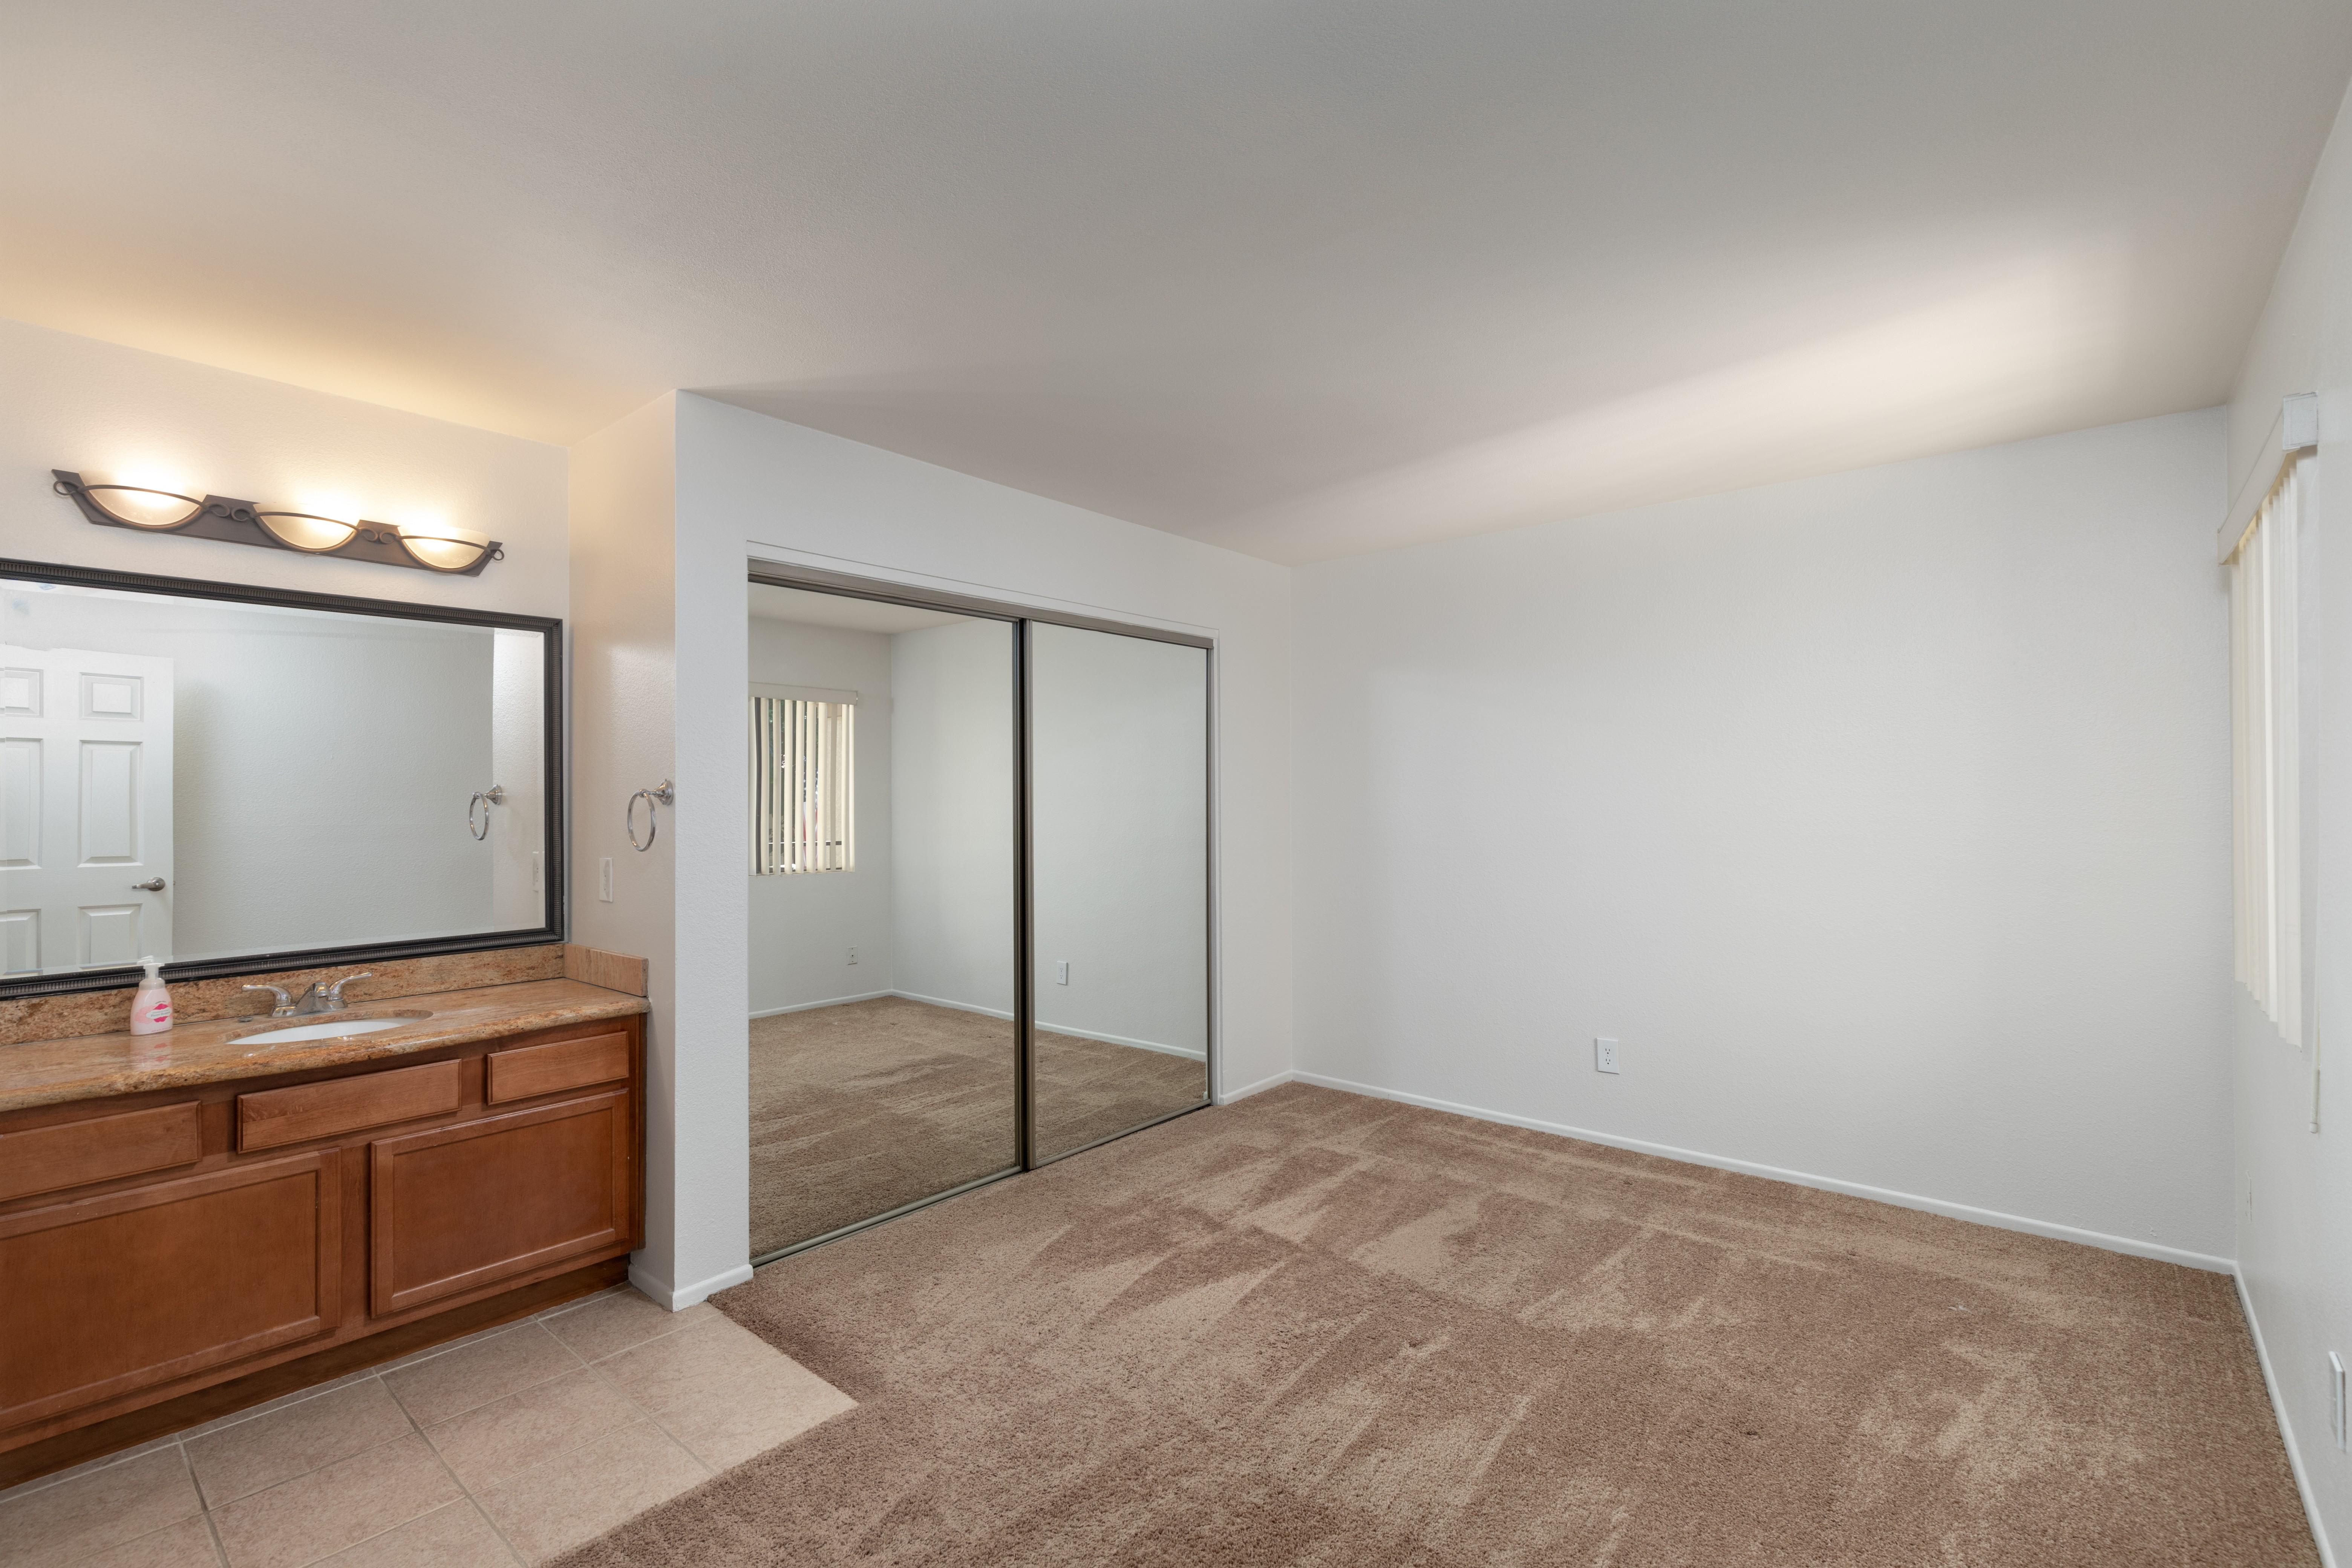 1110 W. Blaine Street 208, Riverside, CA 92507